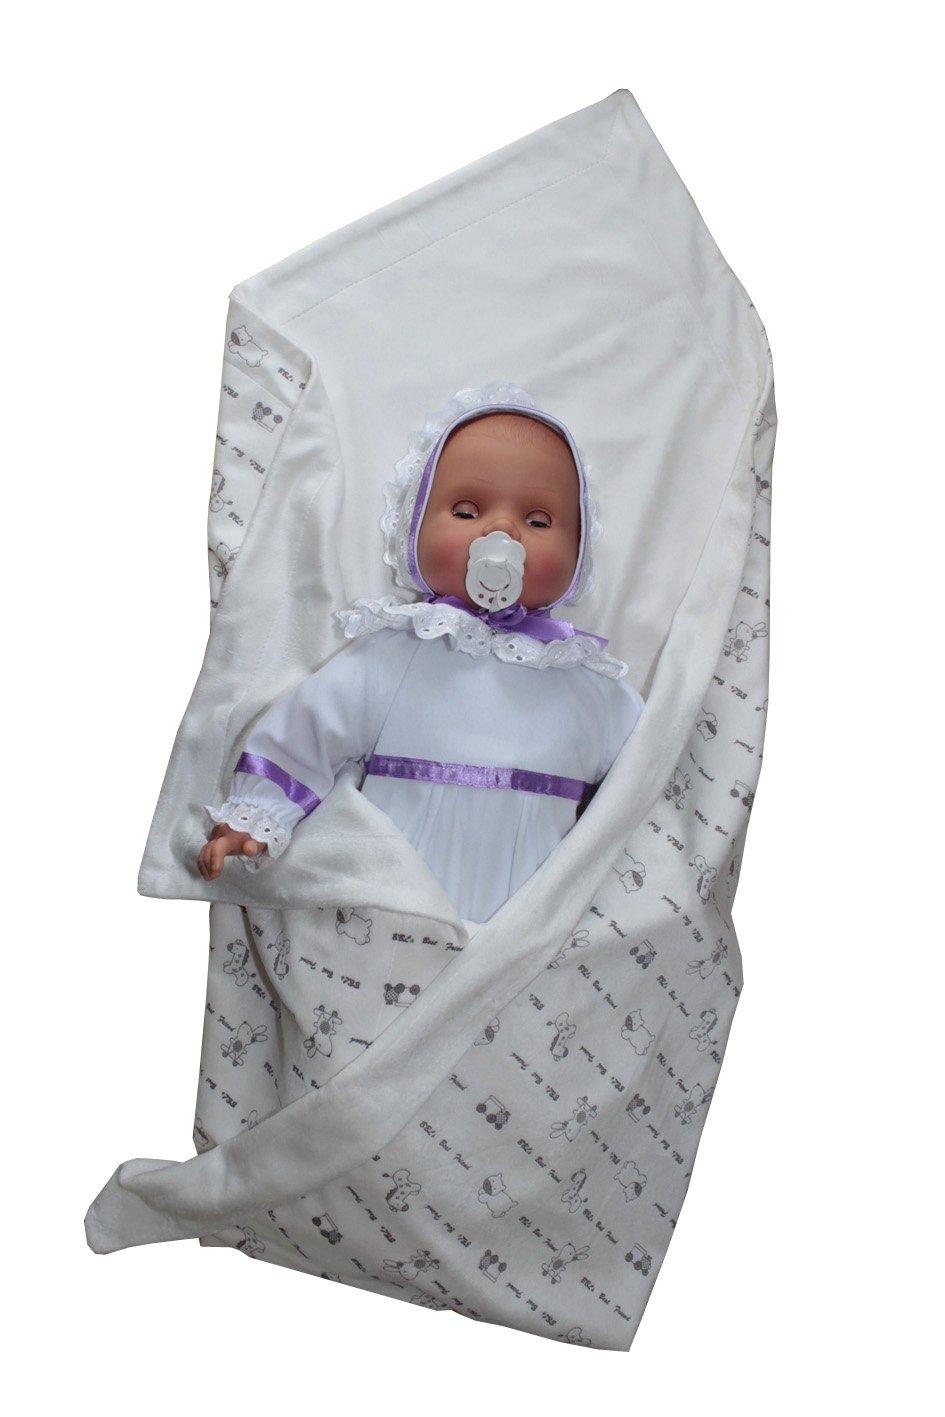 Купить Плед детский Облачко , 80х112 см, Детские одеяла и подушки